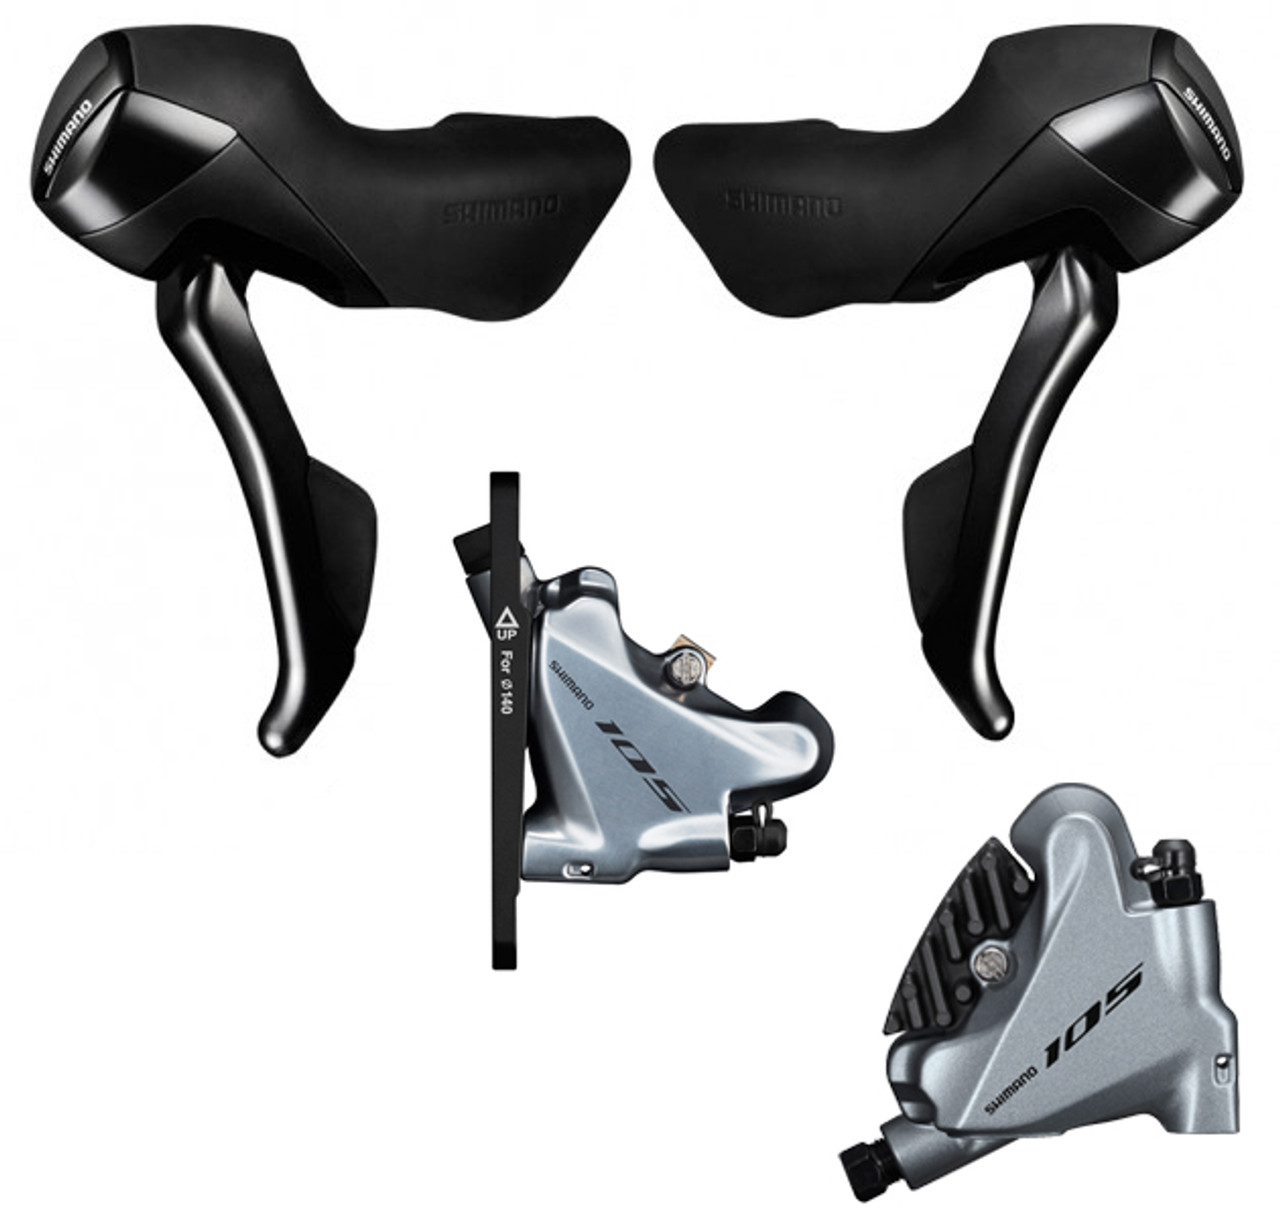 Black ST-R7020 Hydraulic Disc Brake Set Shimano 105 2x11-Speed BR-R7070